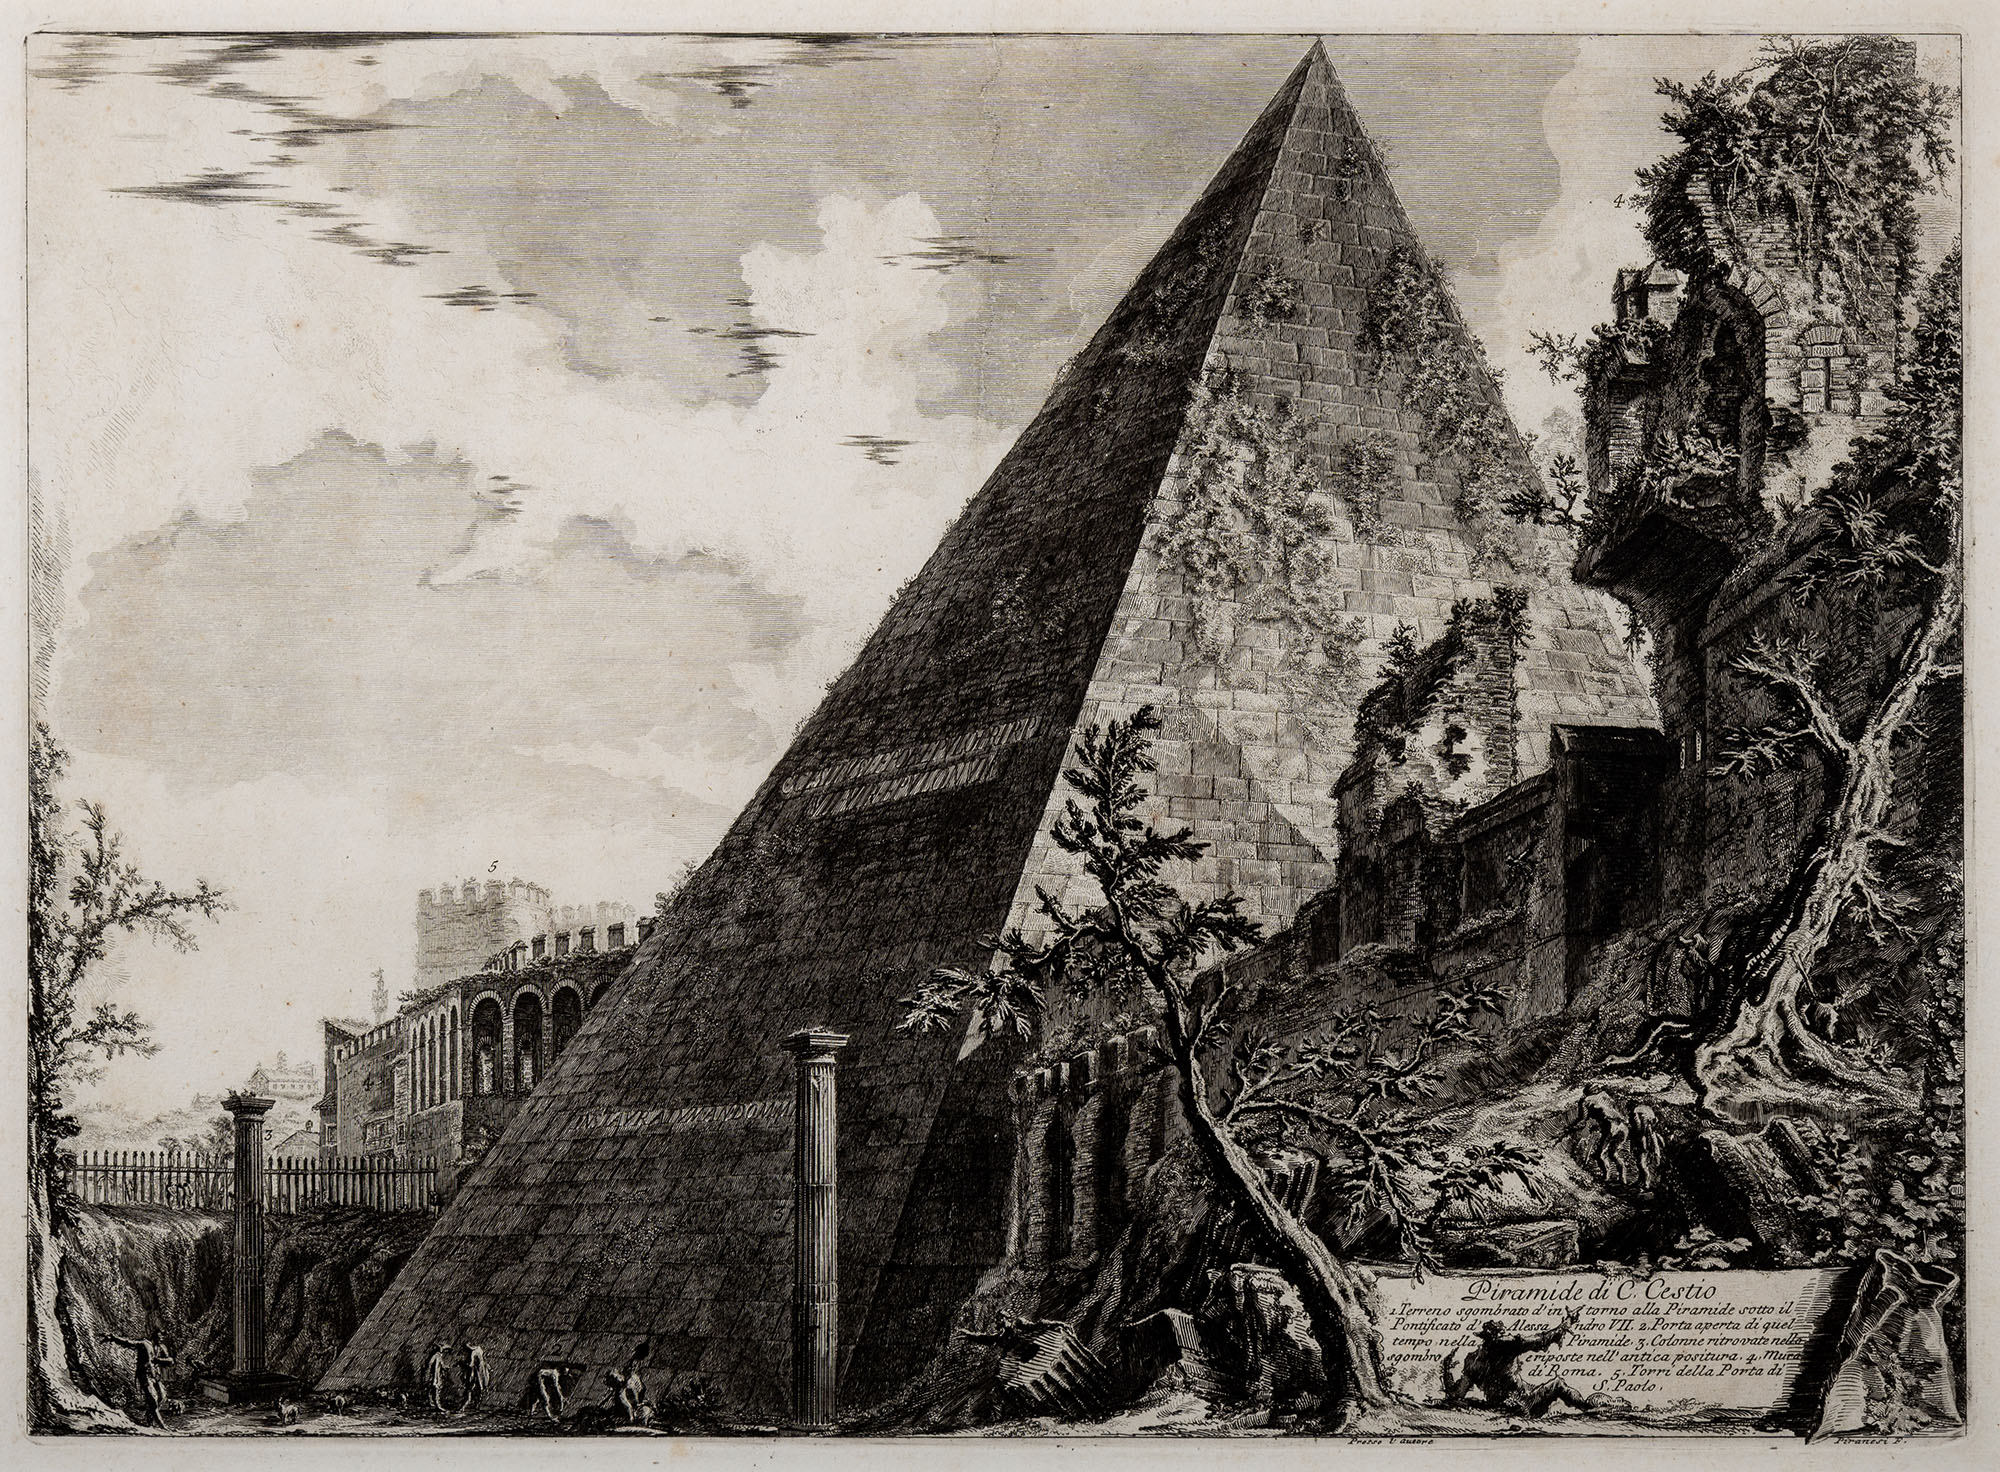 7. Piramide di C. Cestio